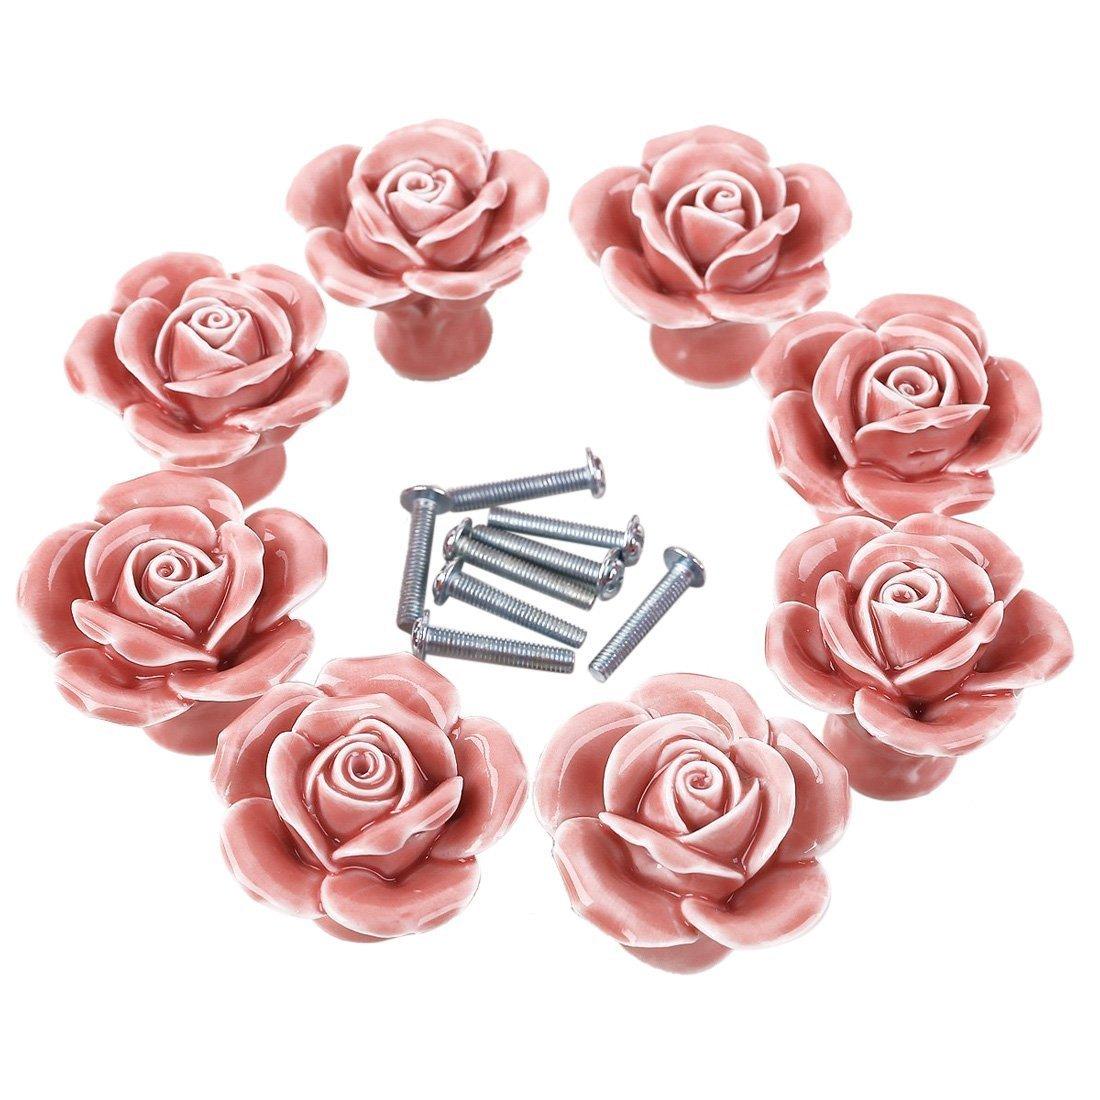 WOLFBUSH Knobs, 8Pcs Elegant White/Pink Rose Pulls Flower Ceramic Cabinet Knobs Cupboard Drawer Pull Handles